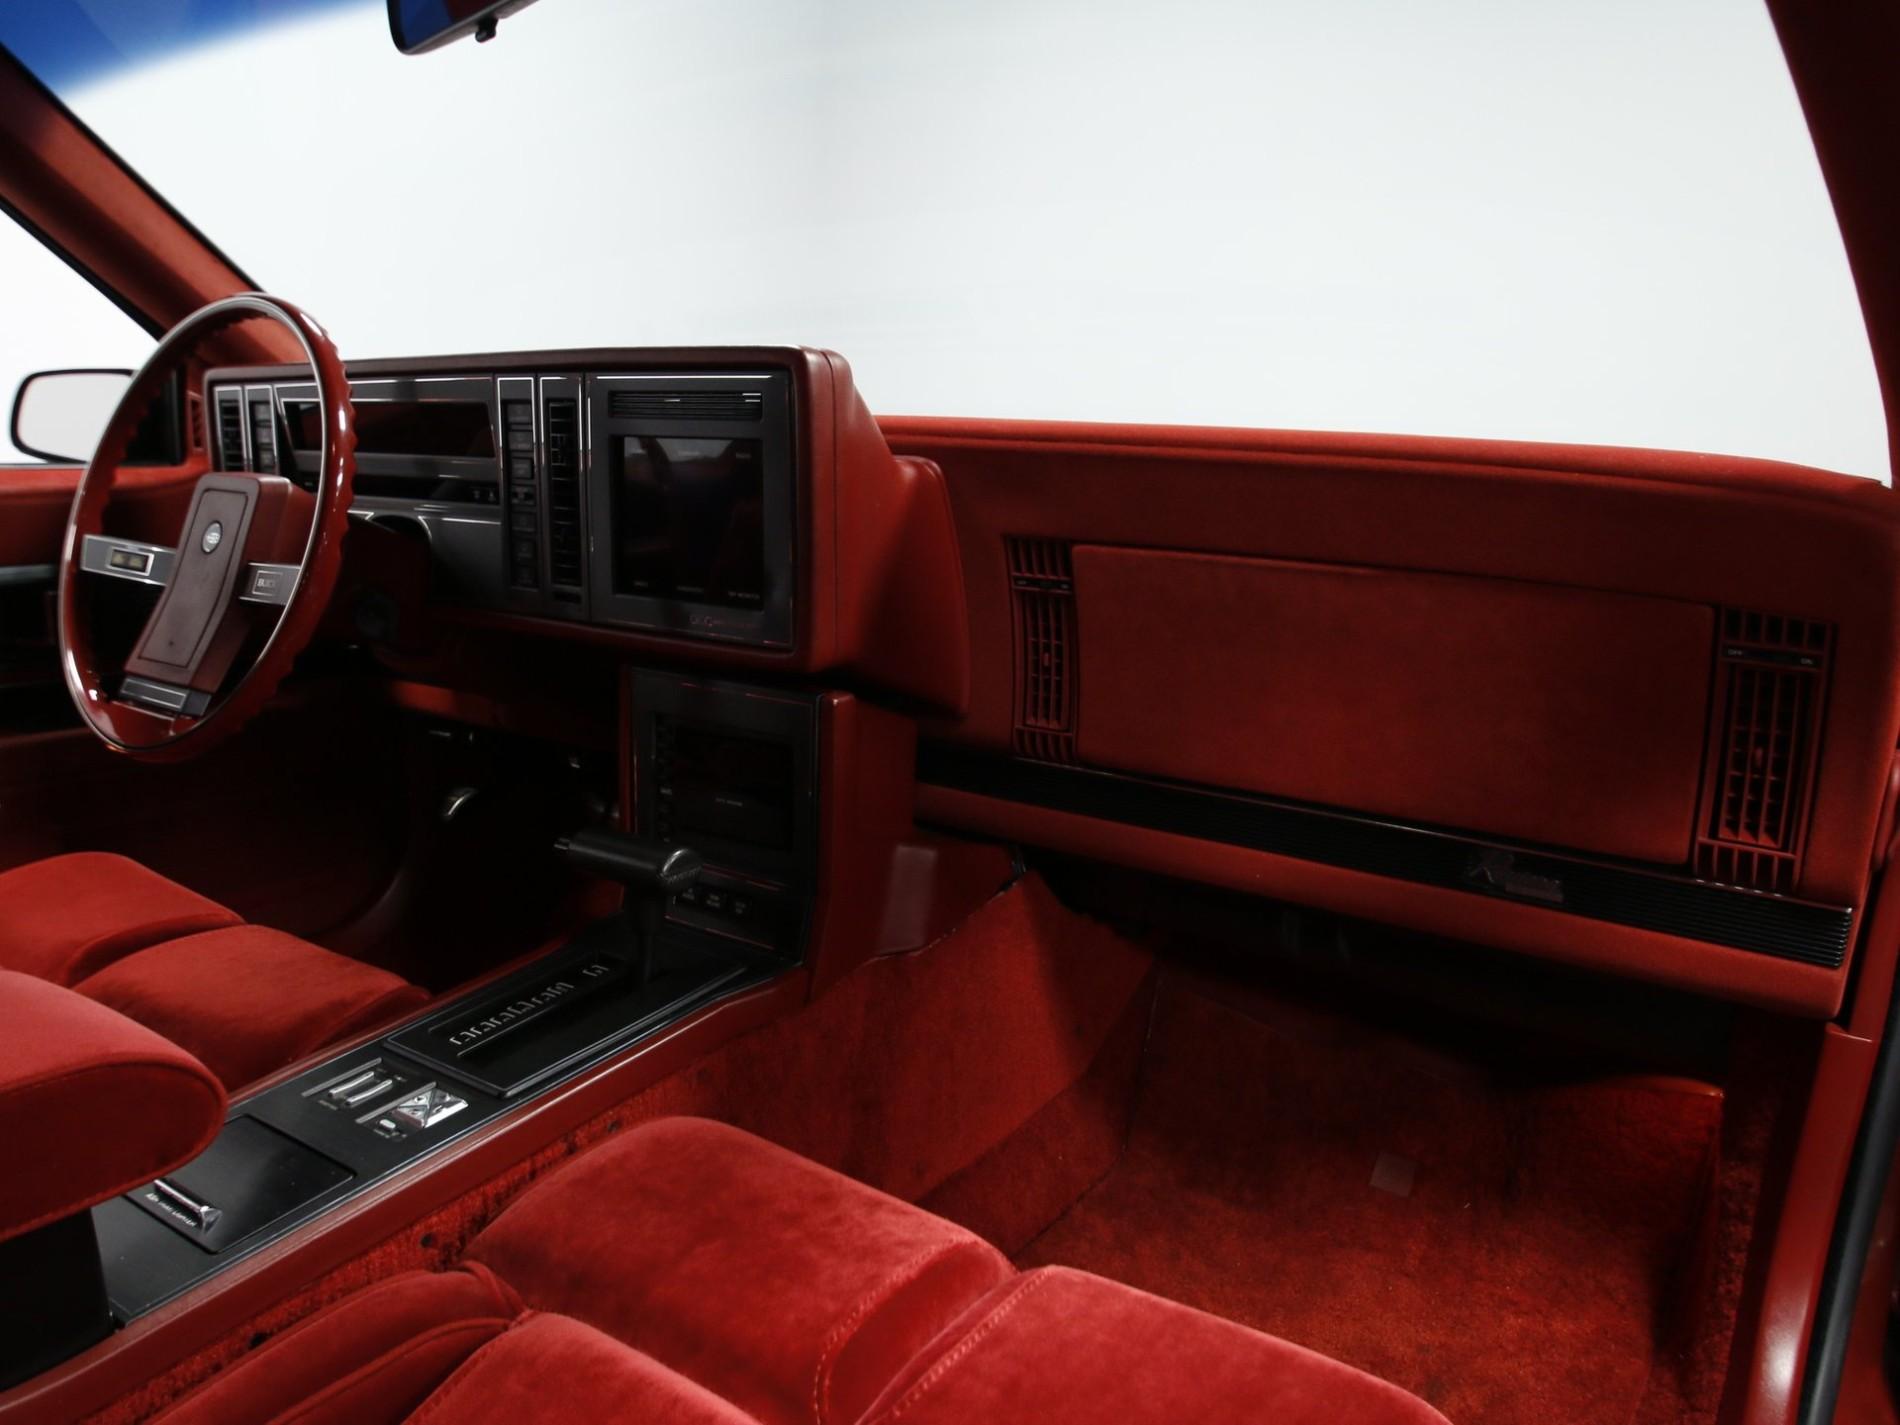 Buick Riviera de vanzare - Buick Riviera de vanzare